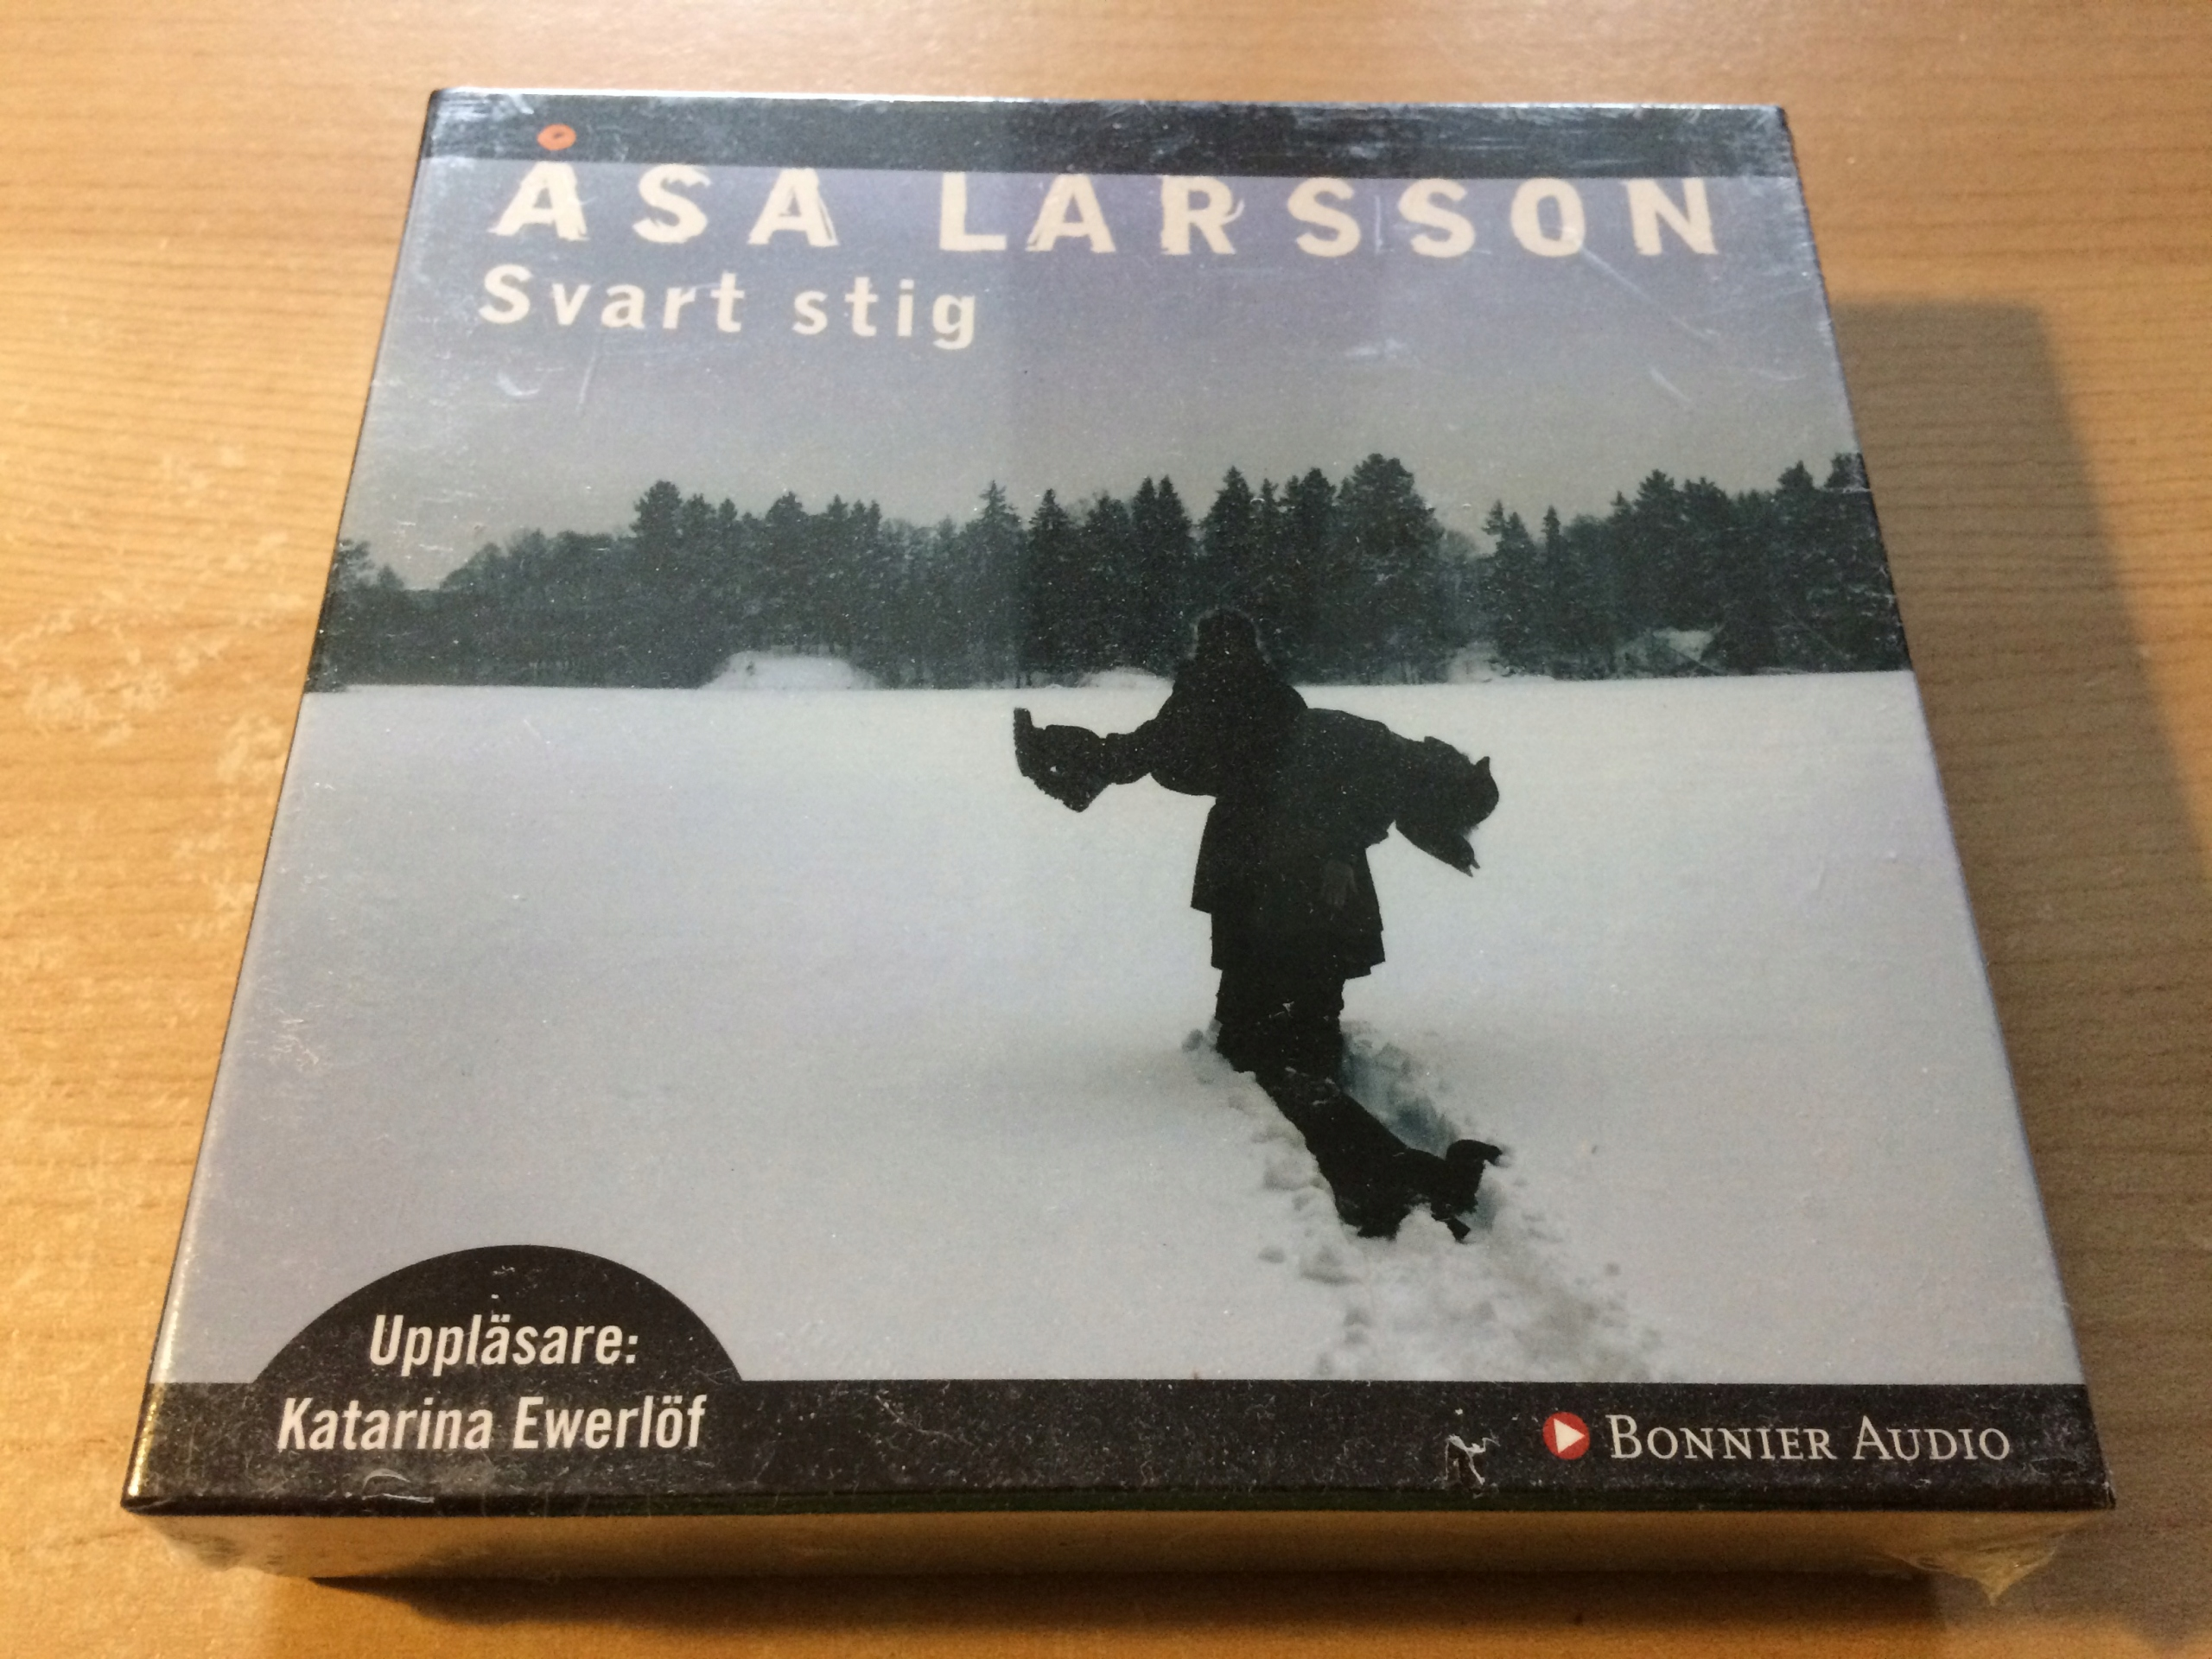 ASA LARSSON SVART STIG 9CD